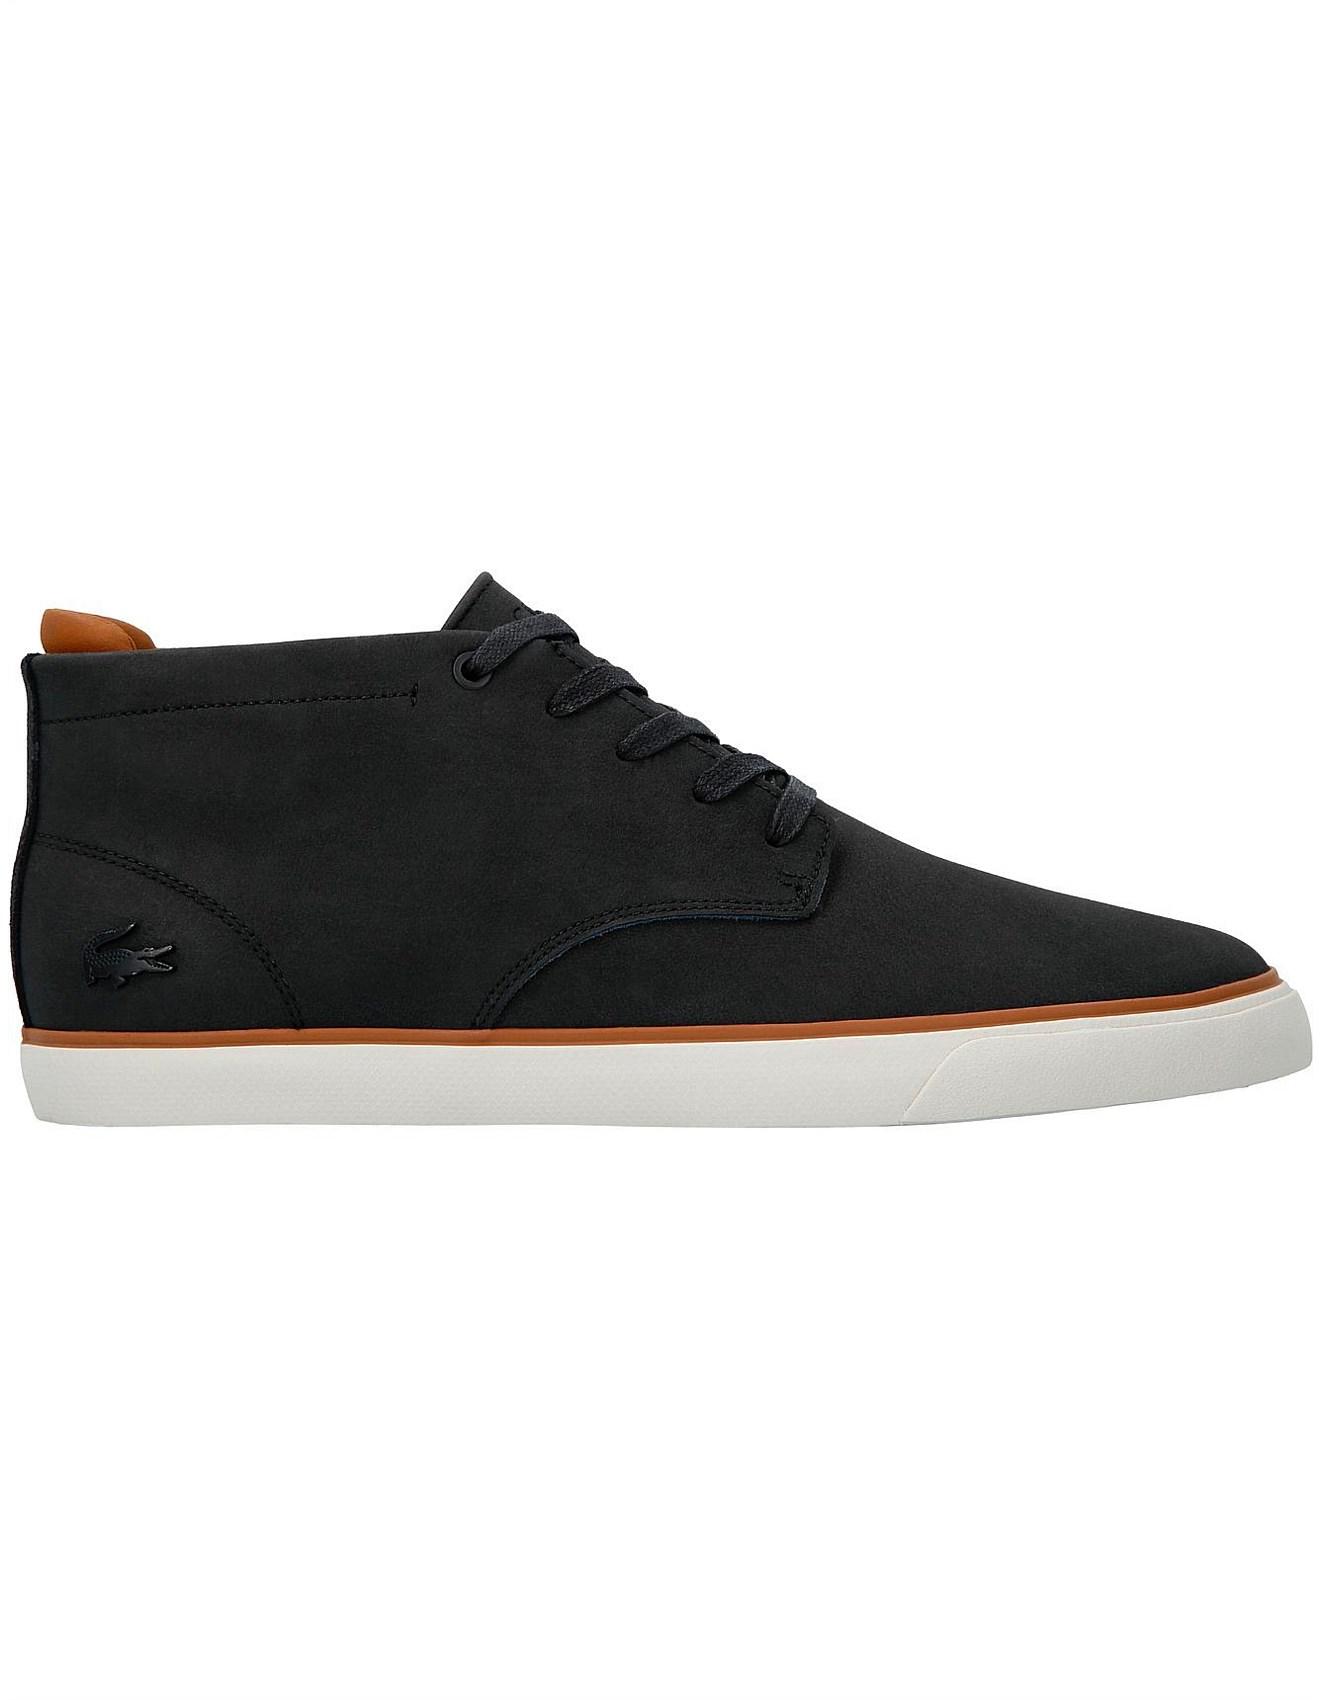 052a7db8c Shoes - ESPARRE CHUKKA 318 1 CAM BLK BRW